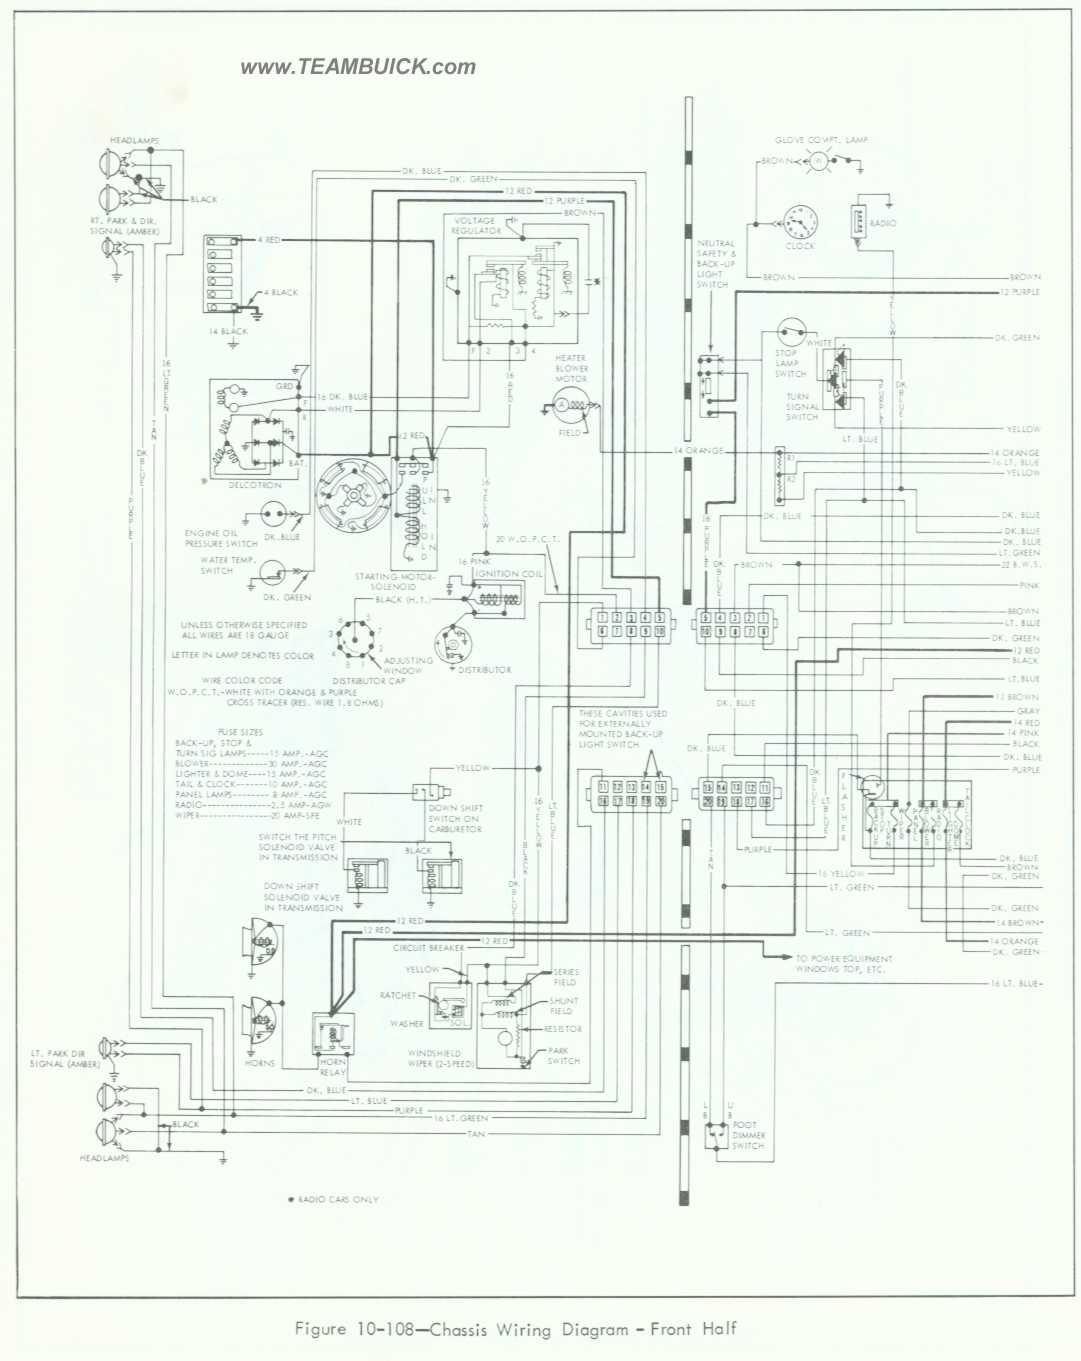 1964 skylark wiring diagram